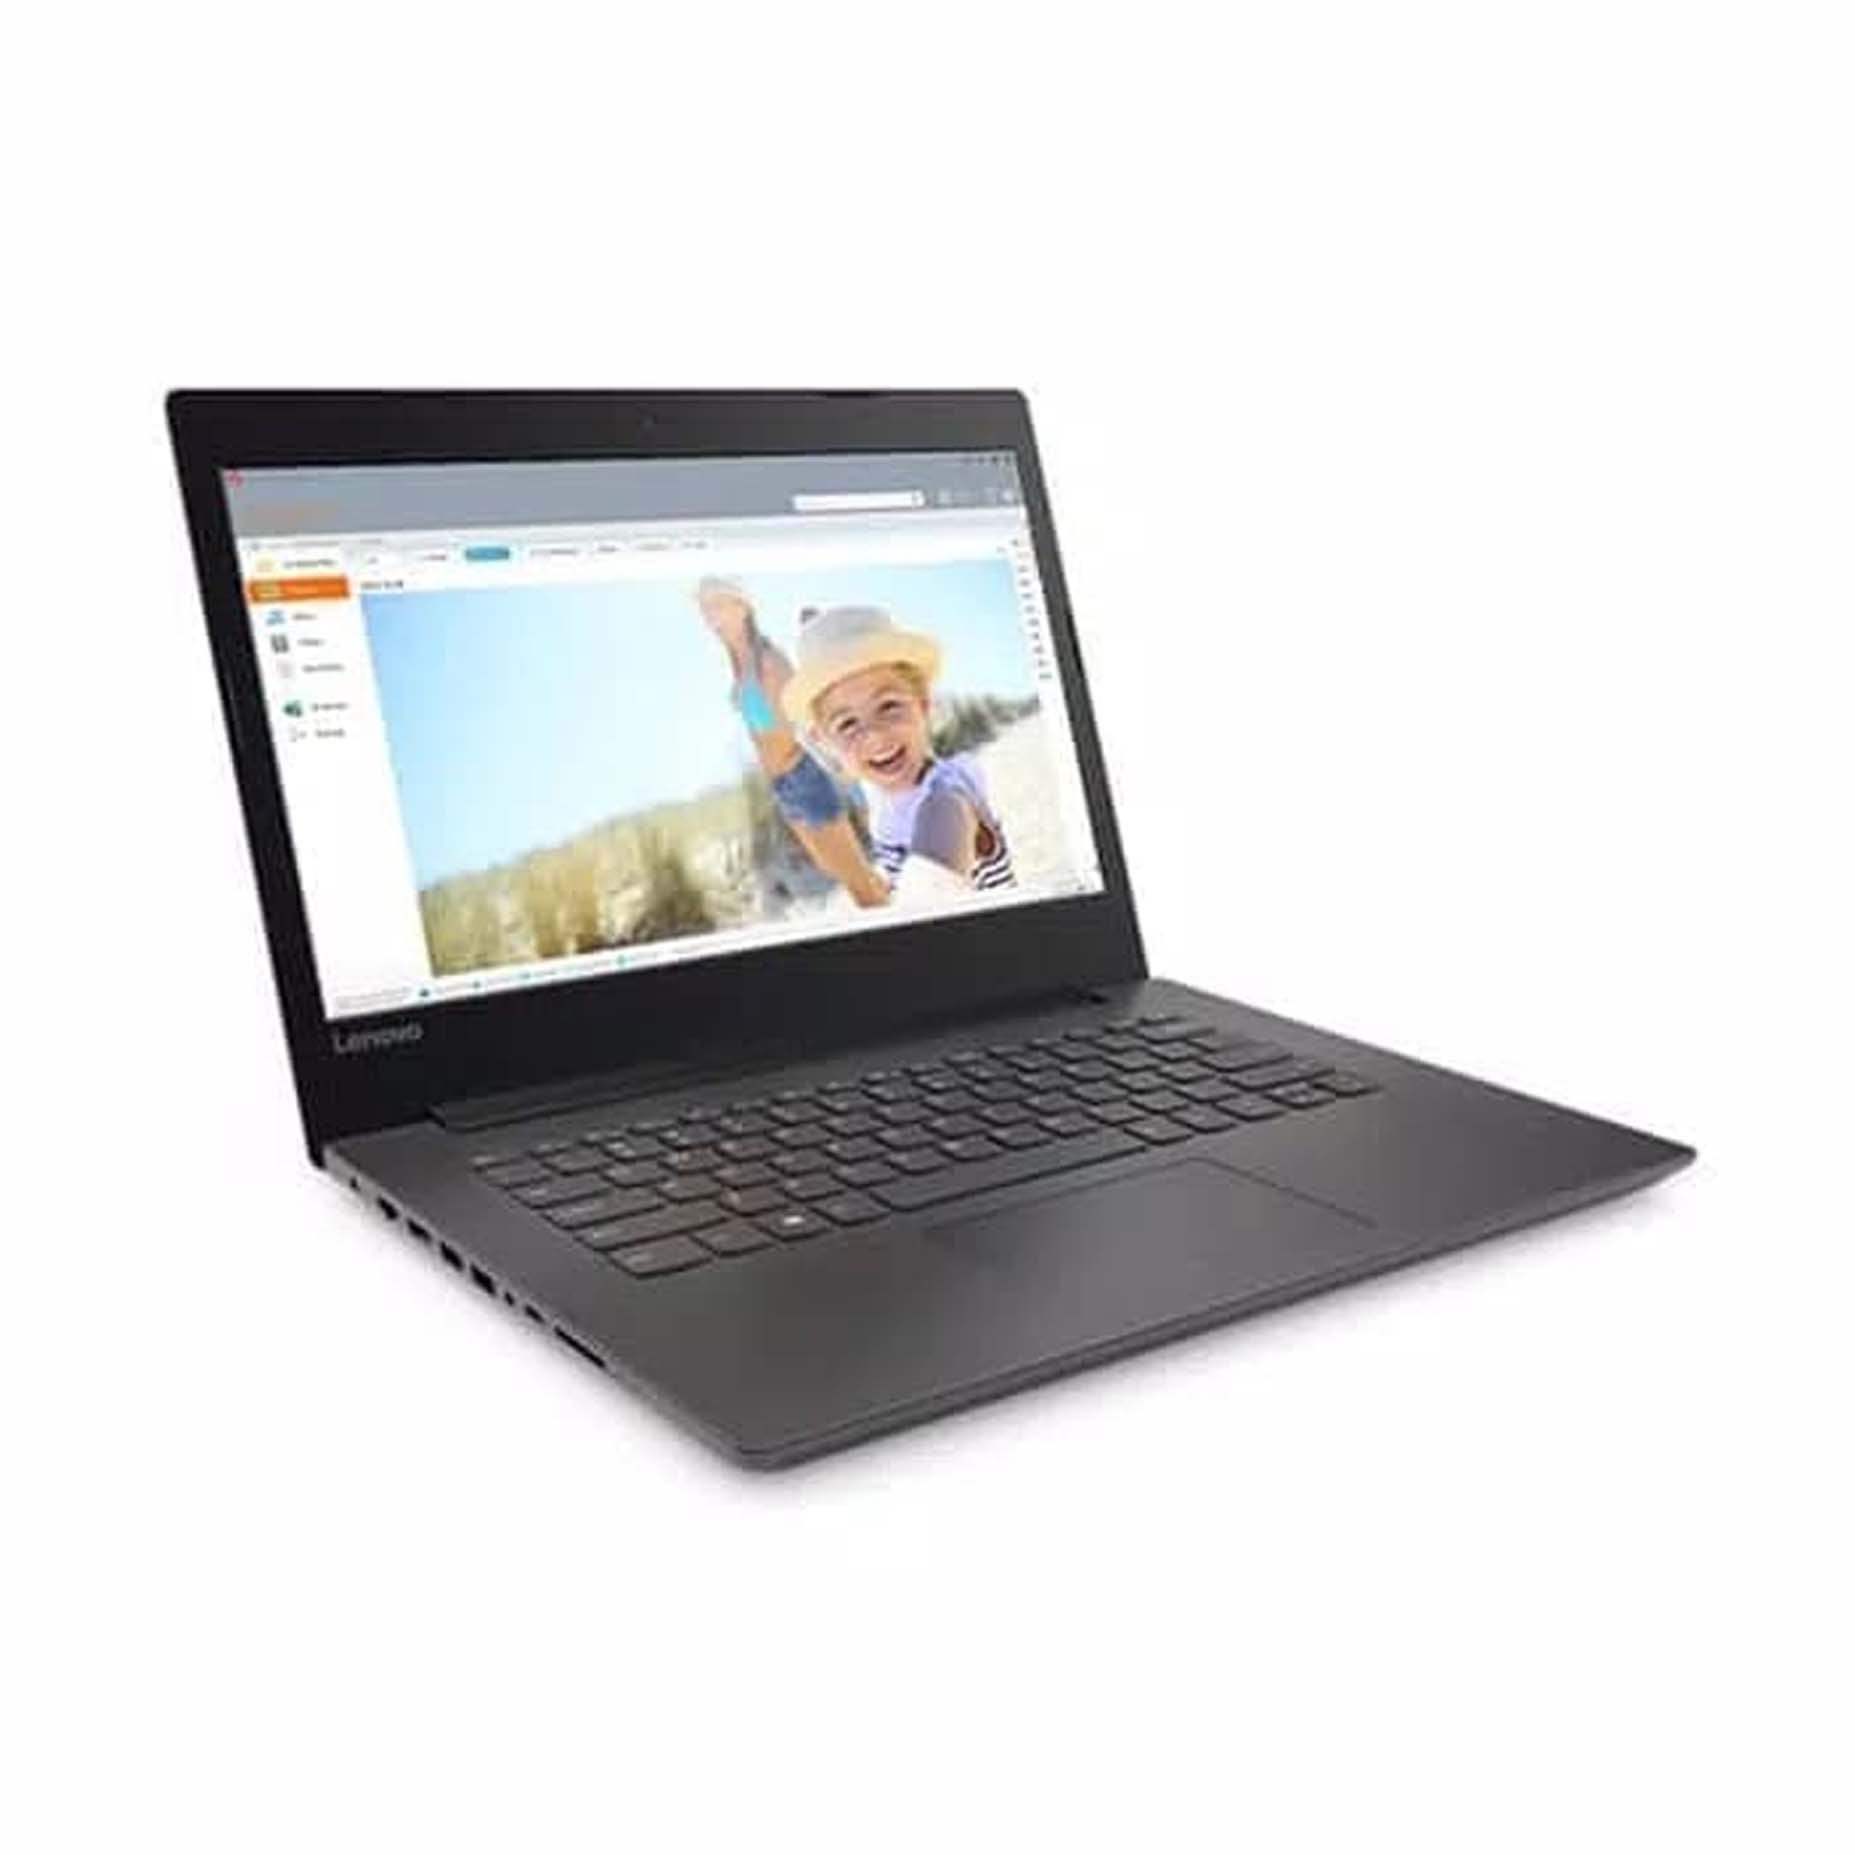 Harga Lenovo Ideapad IP330-14AST 3BID Laptop AMD Dual Core A9-9425 4GB 1TB AMD Radeon 530 2GB 14 Inch DOS Black